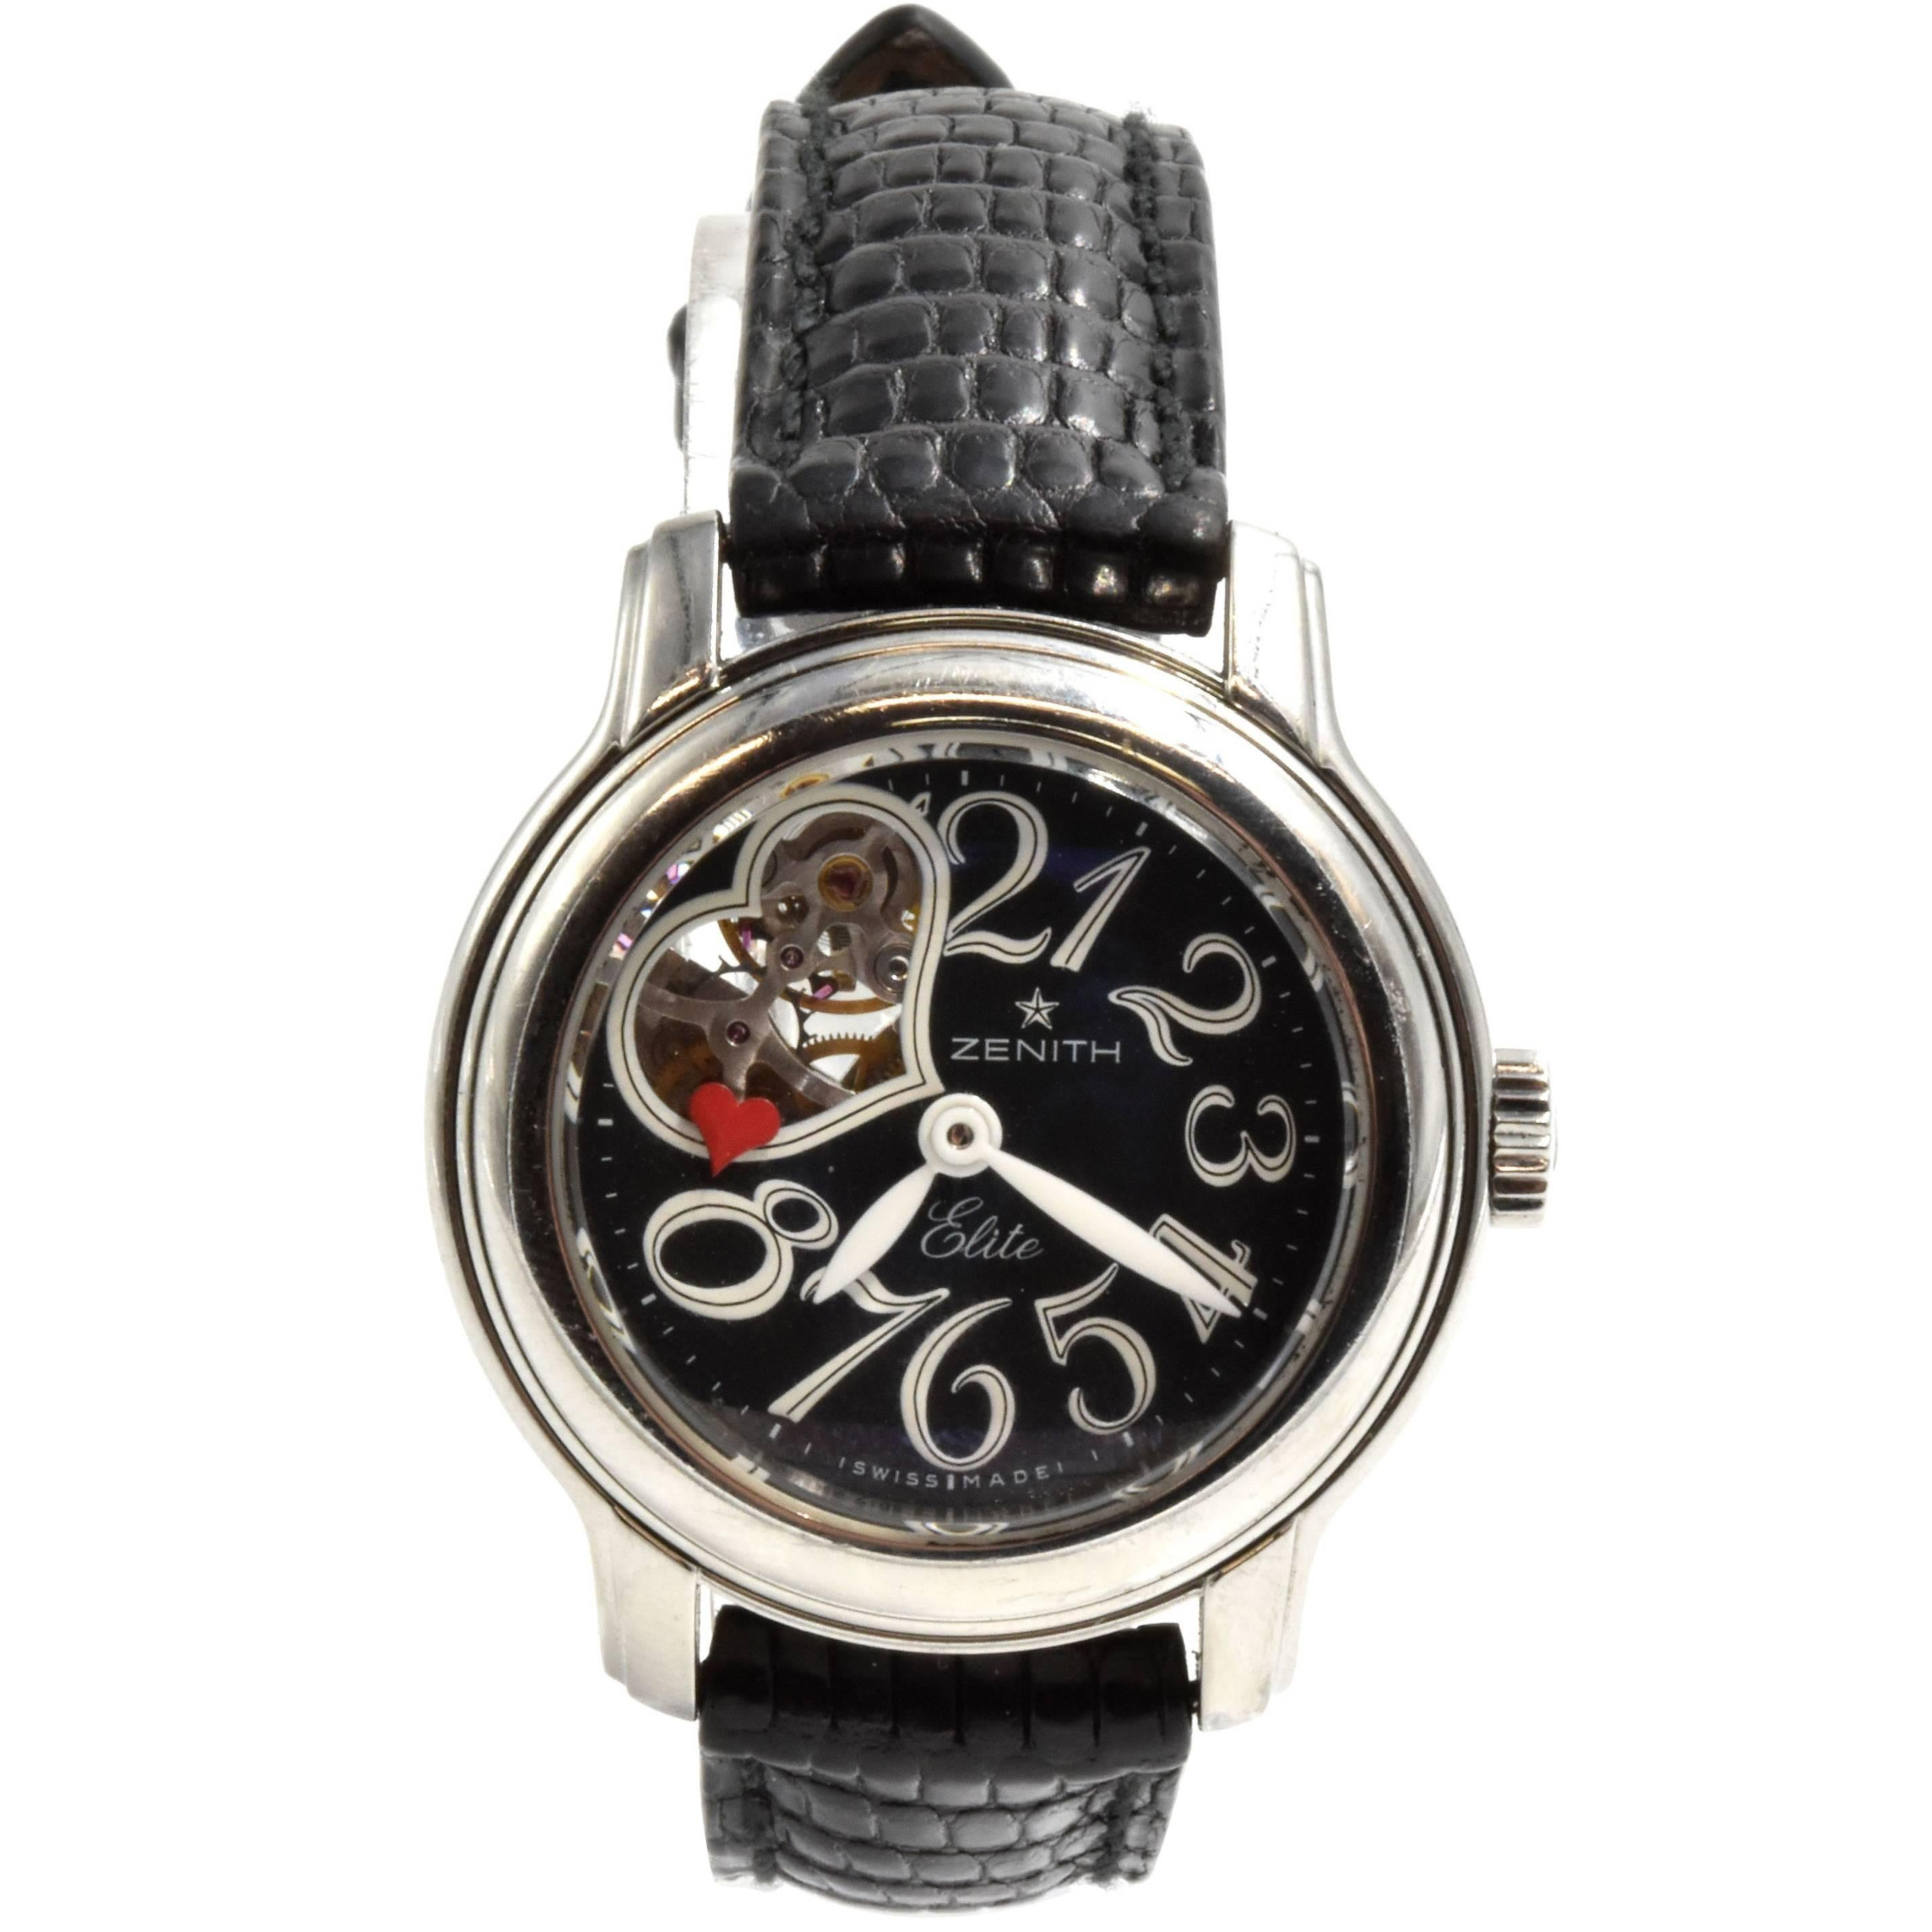 Zenith Ladies Stainless Steel Elite Chrono-Master Automatic Wristwatch